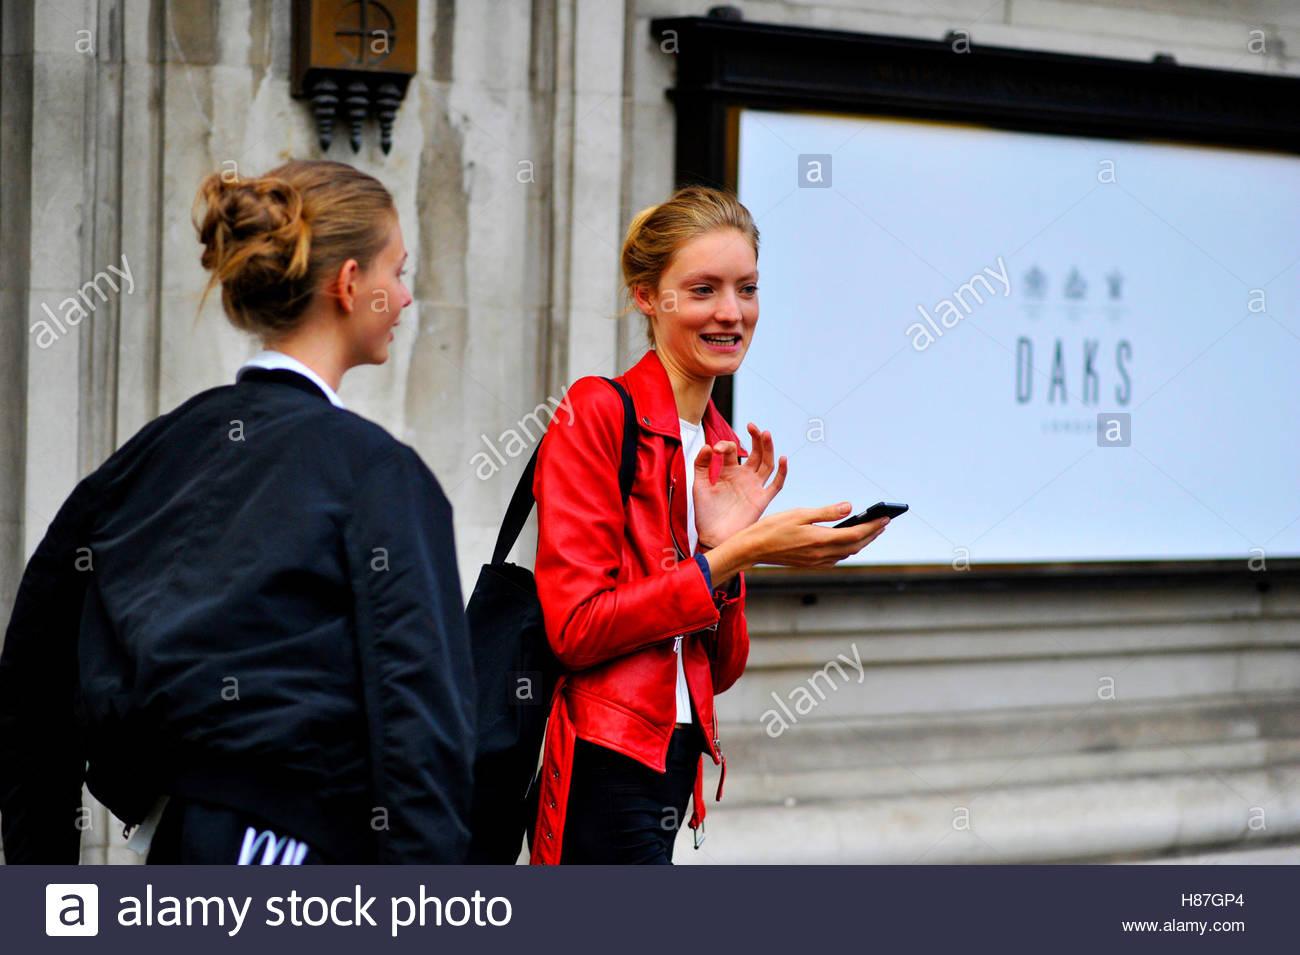 Models after Daks fashion show London Fashion Week SS17 FW16 Street Style September 16 2016. - Stock Image